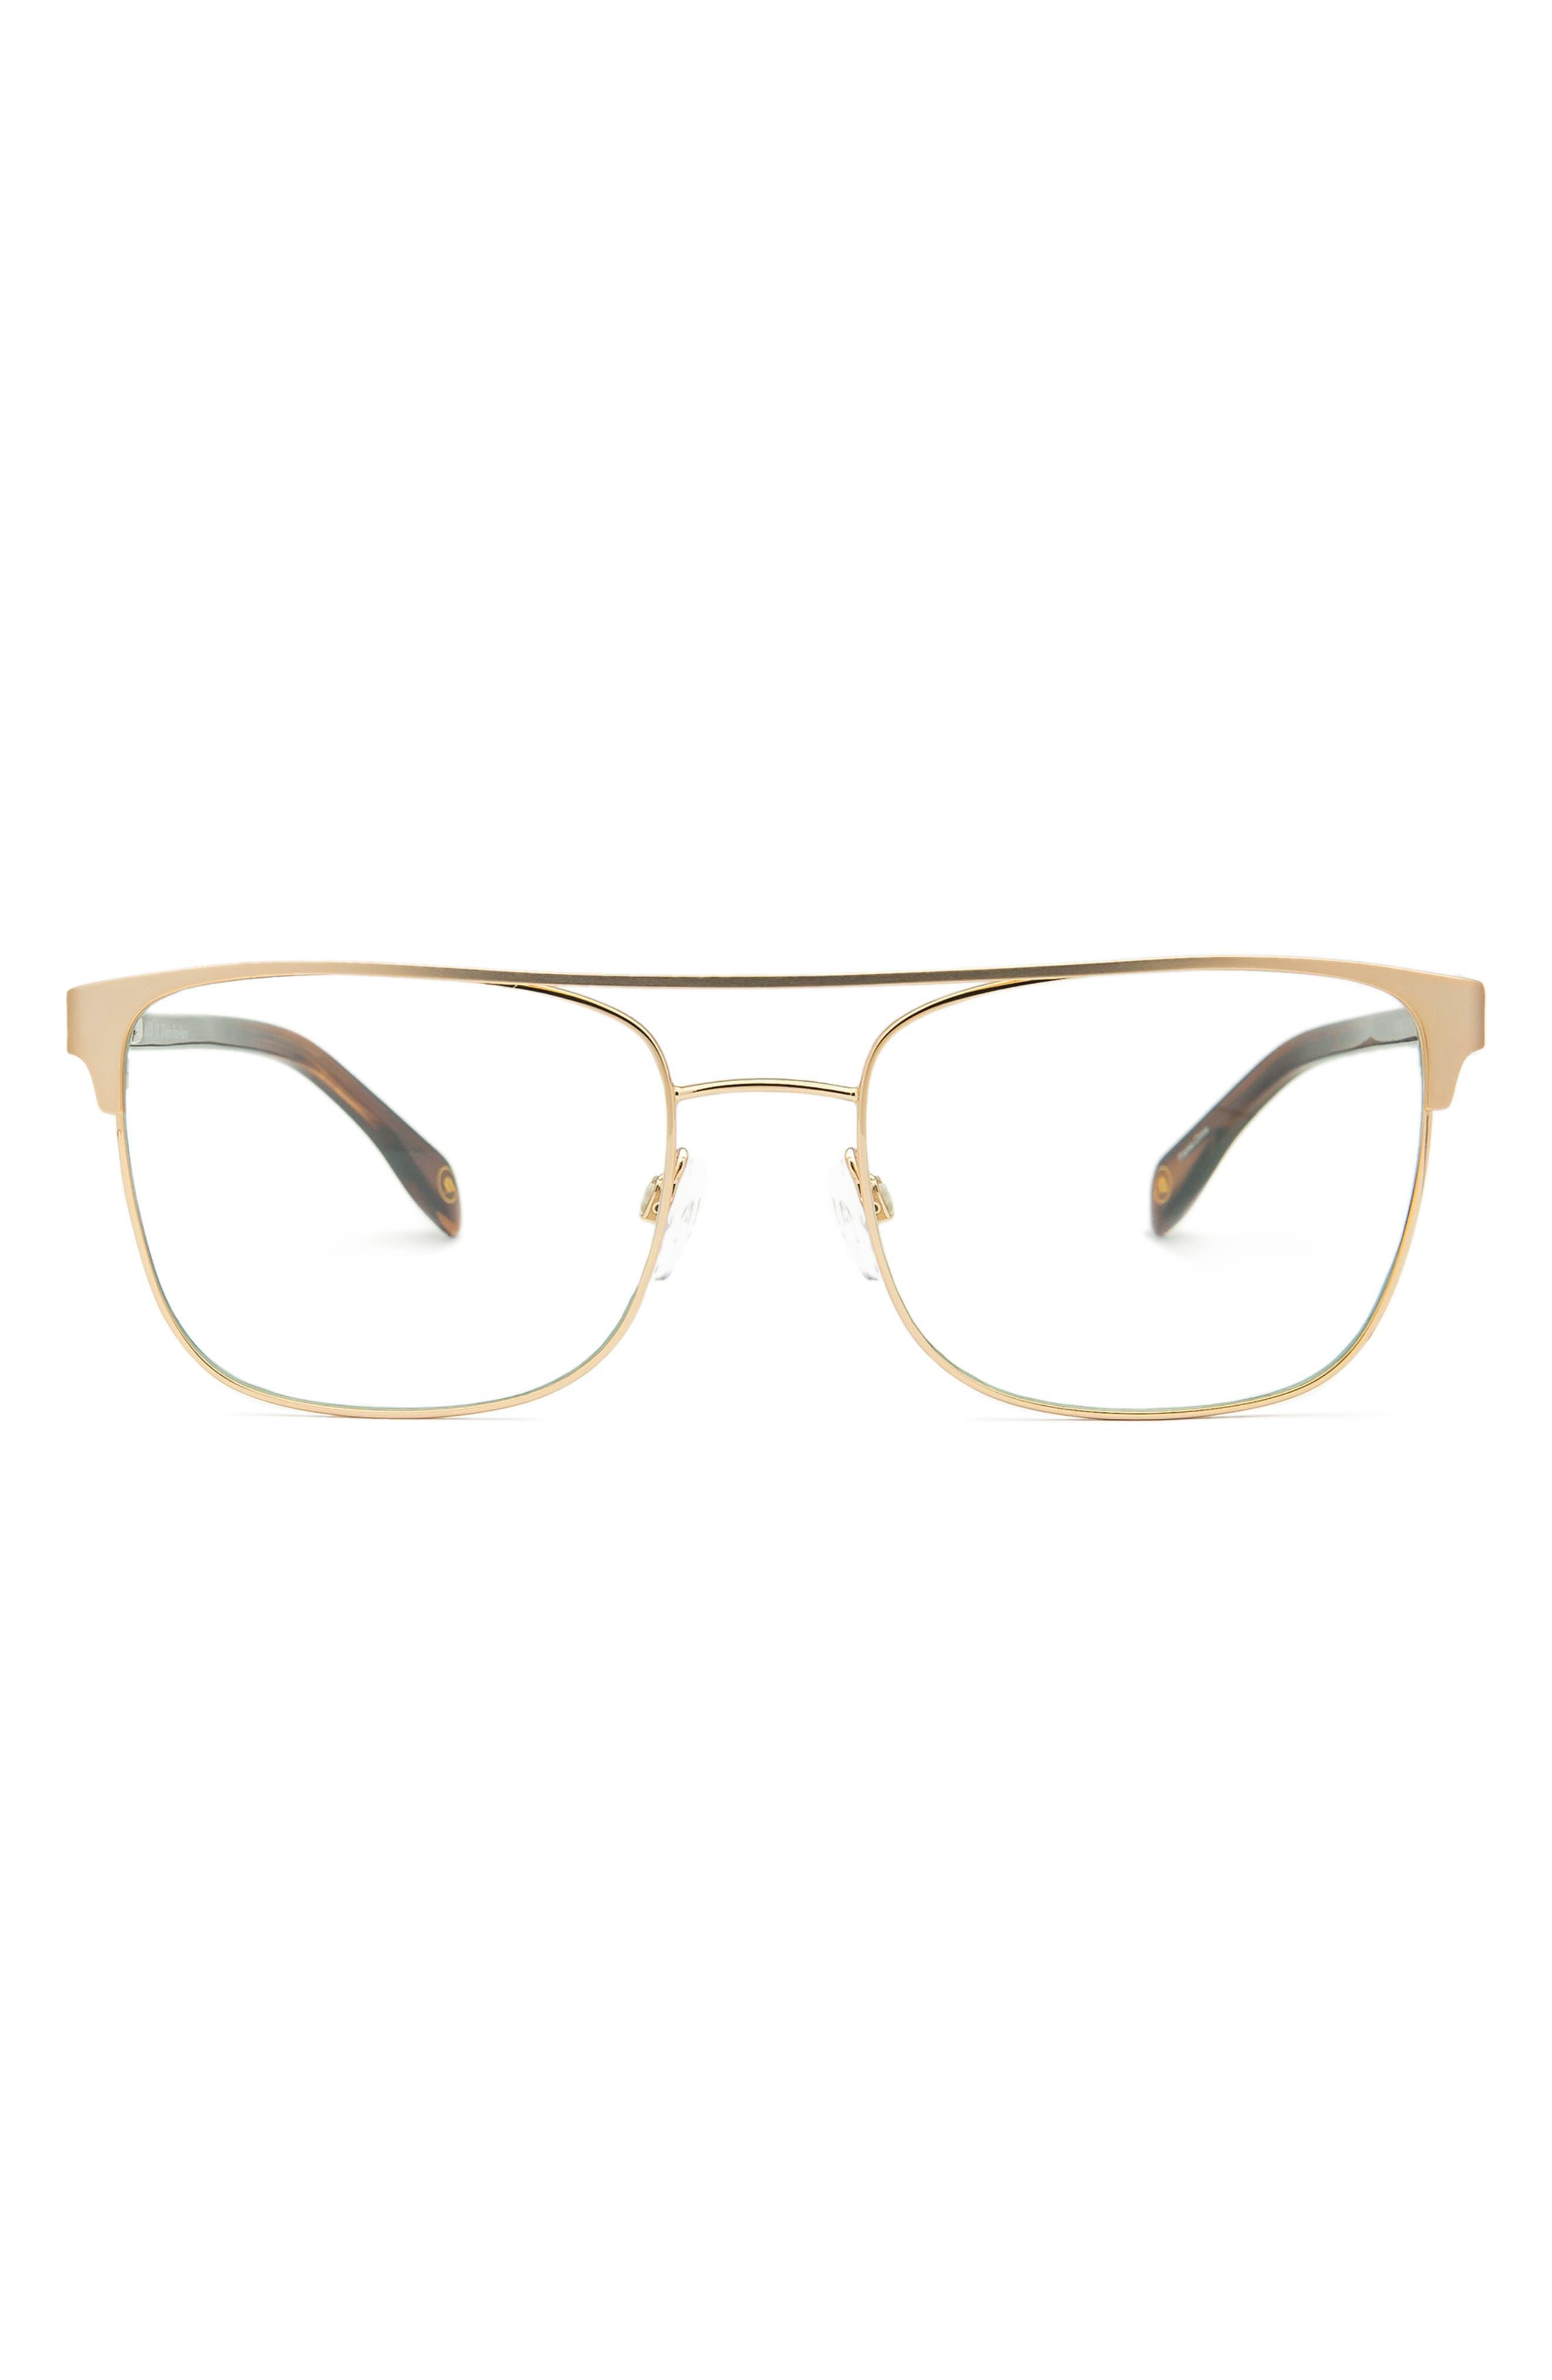 54mm Navigator Blue Light Blocking Glasses